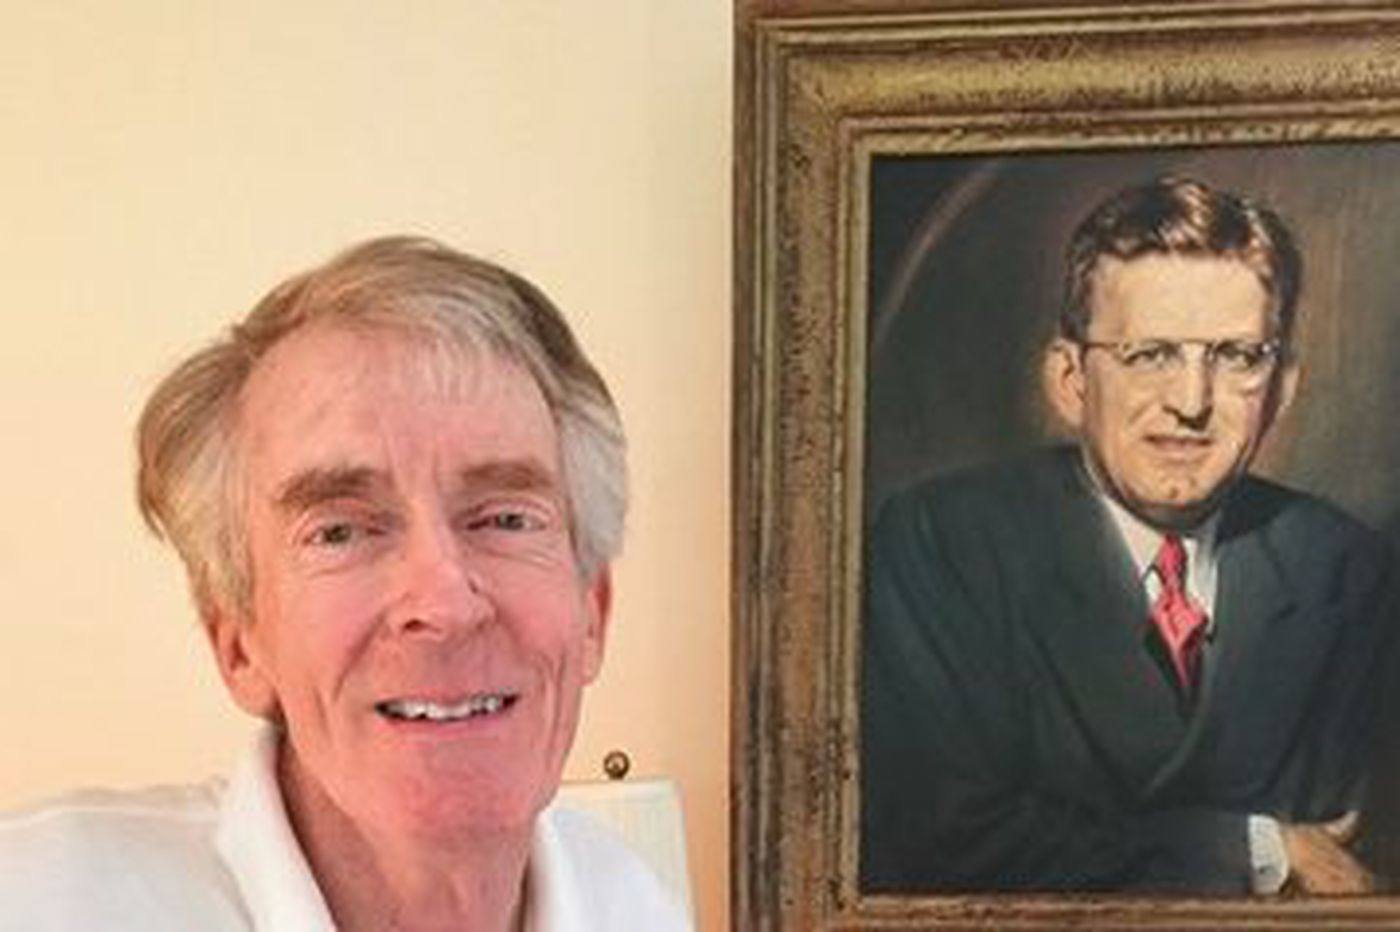 Dr. William H. Erb Jr., 78, noted surgeon and philanthropist